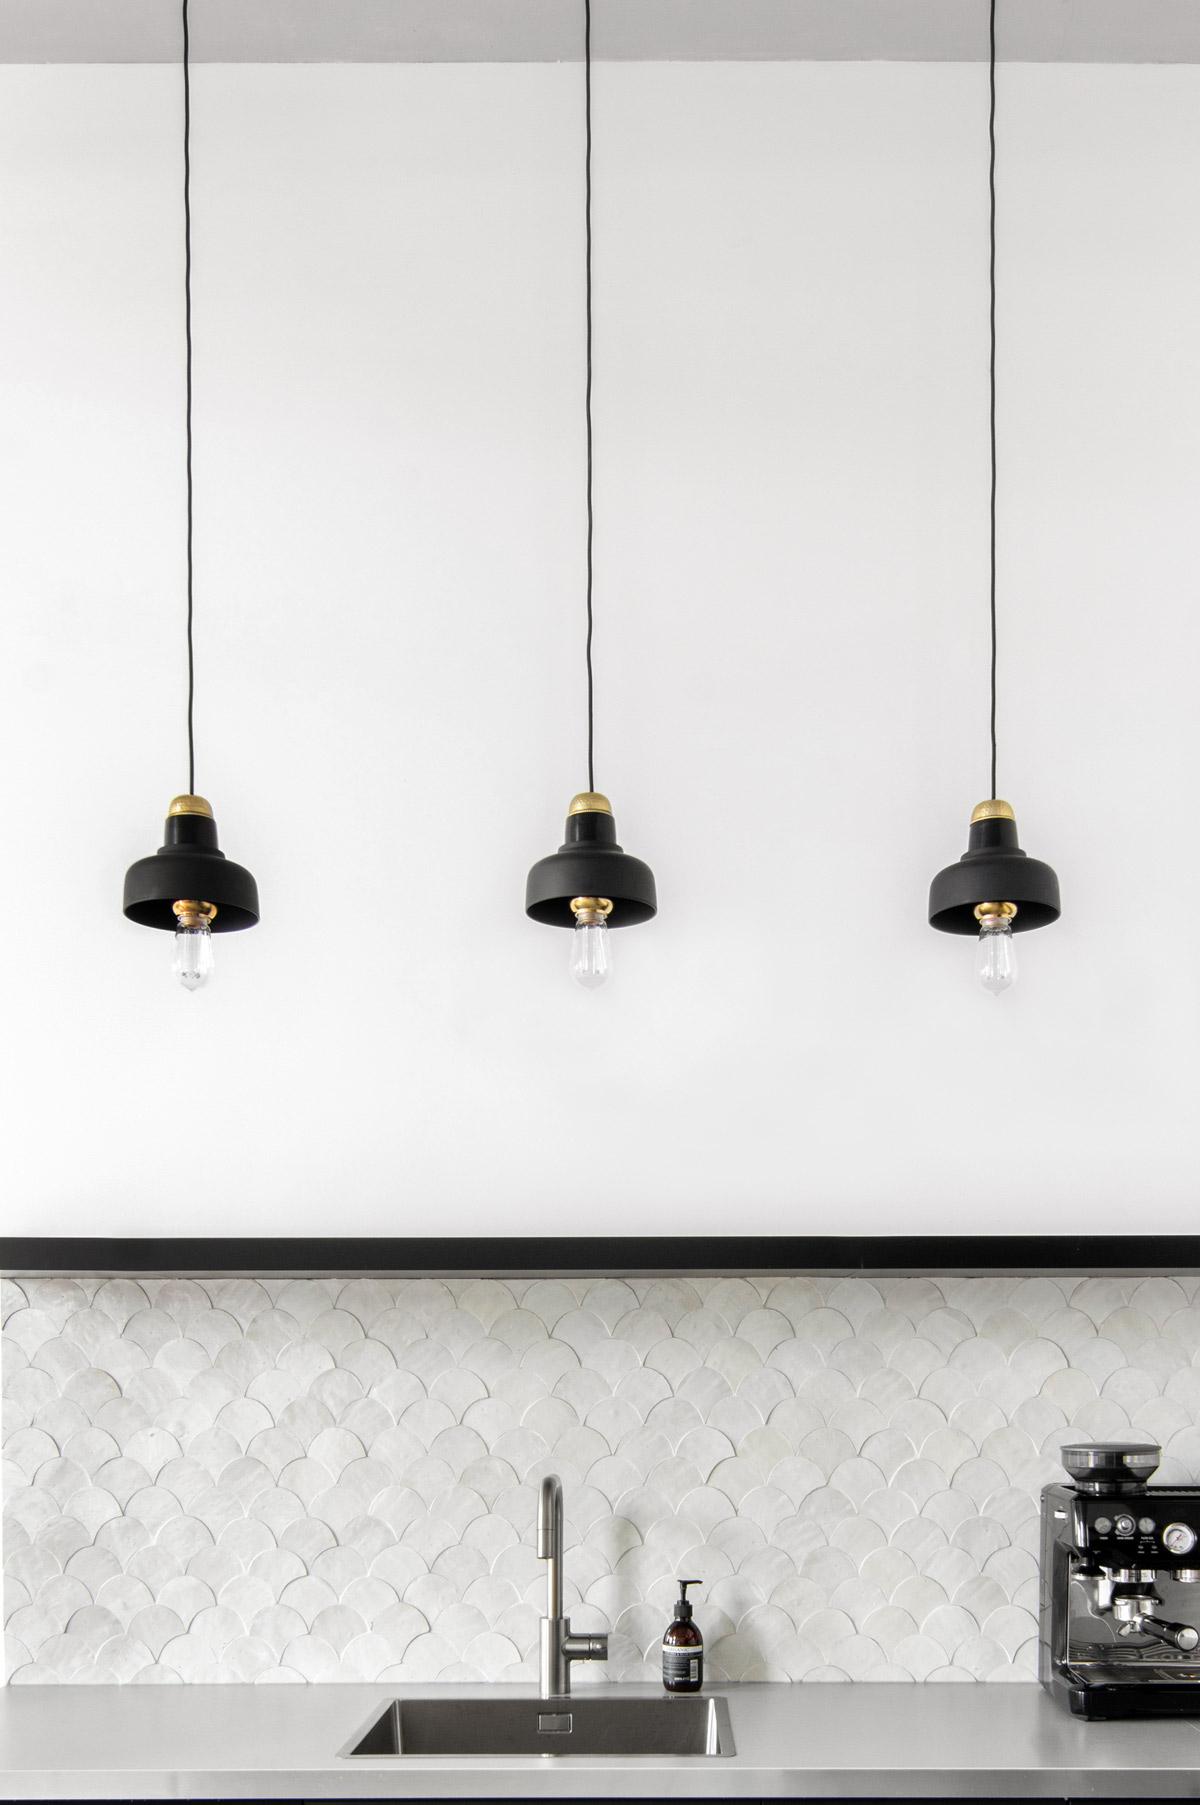 DIY lampen in keuken - Tanja van Hoogdalem